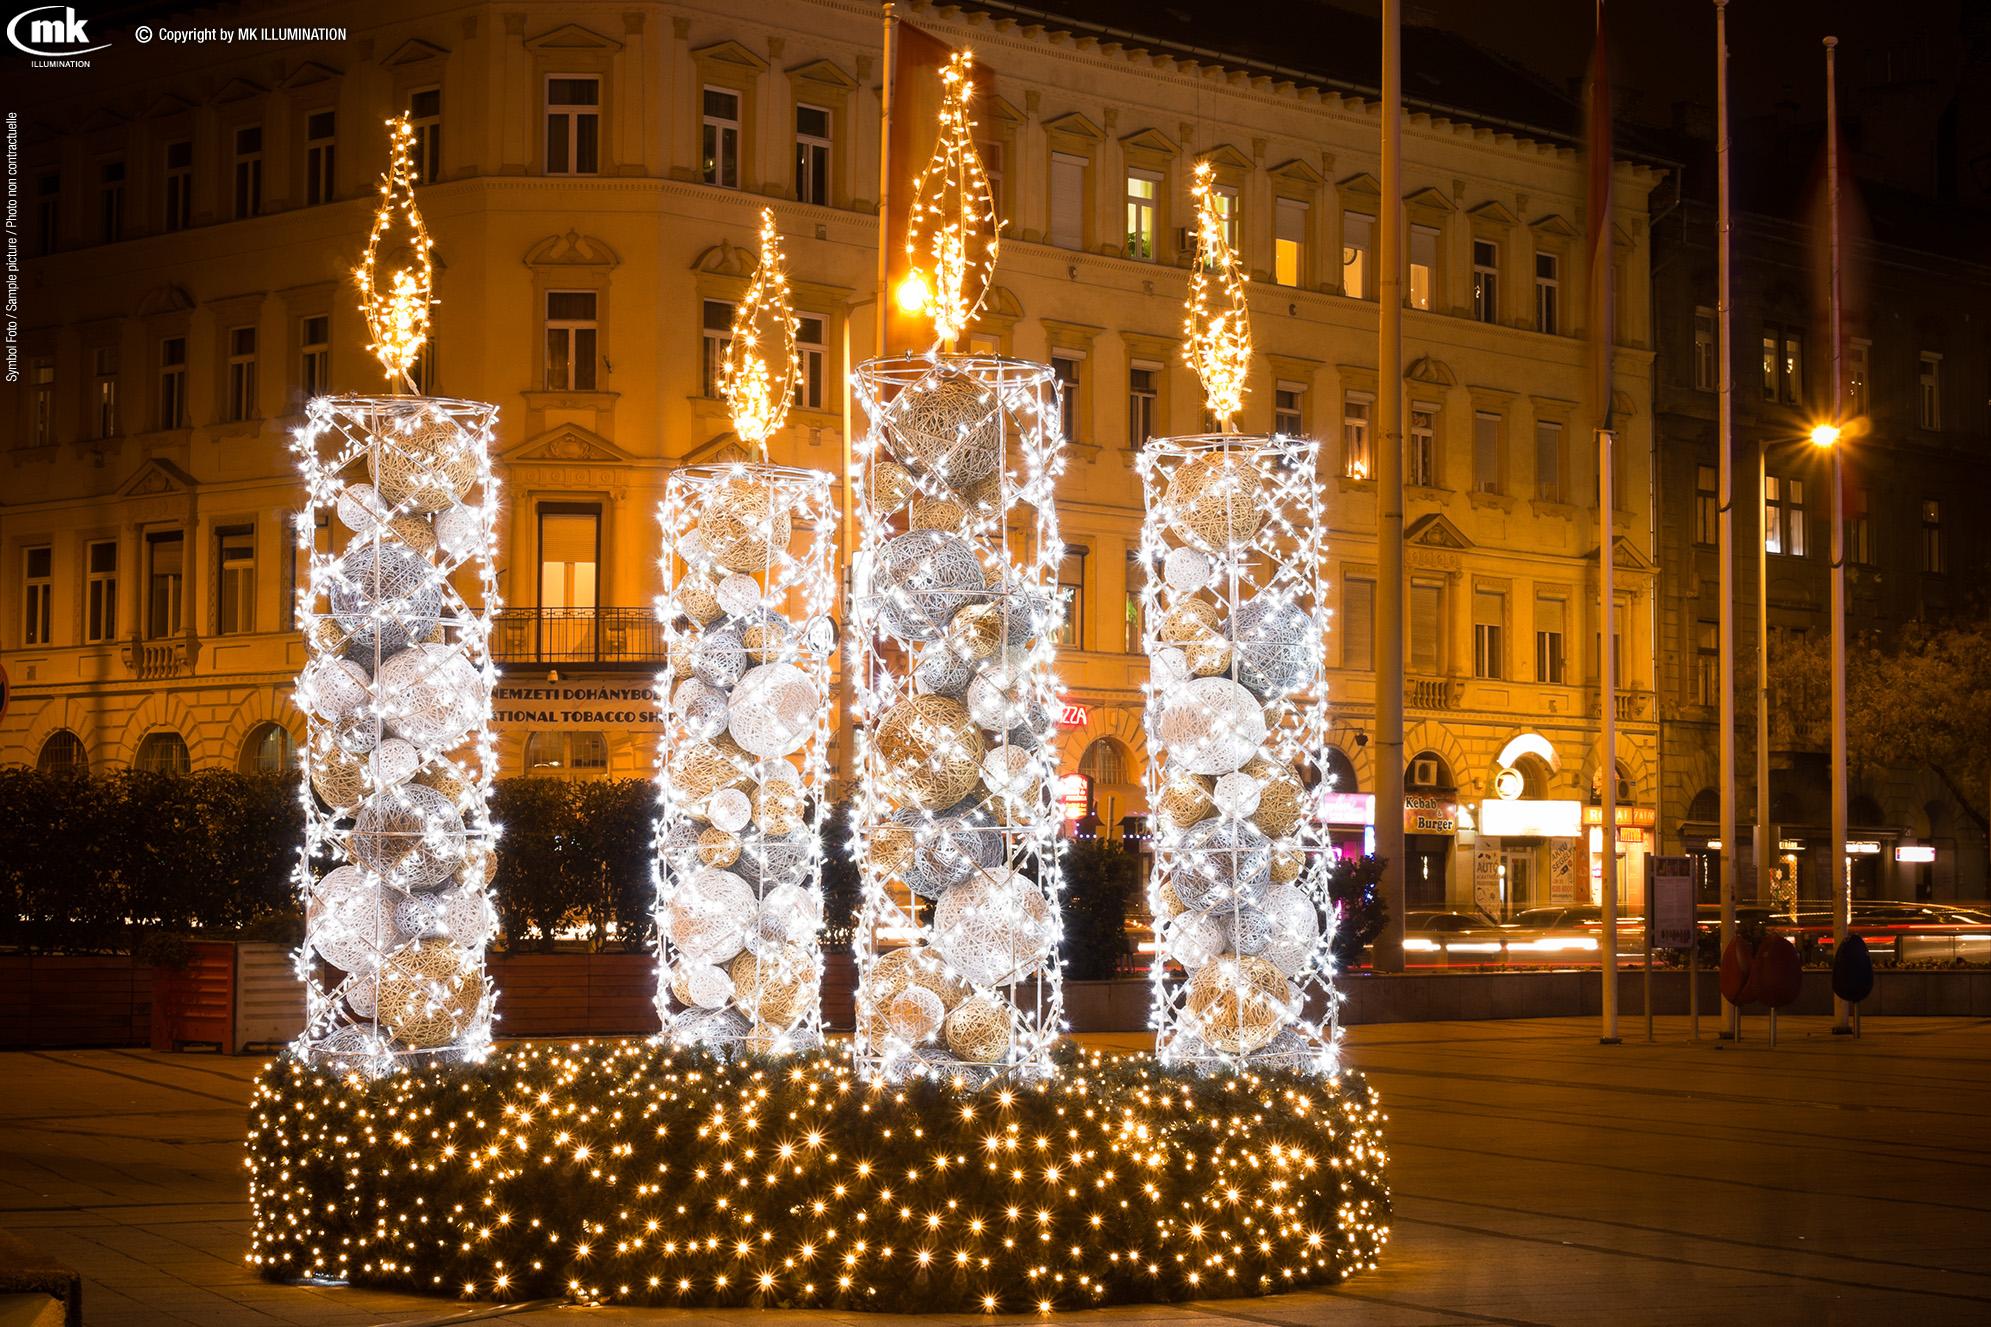 hu_Budapest_Westend_shop_leisure_2015_16_P1120816